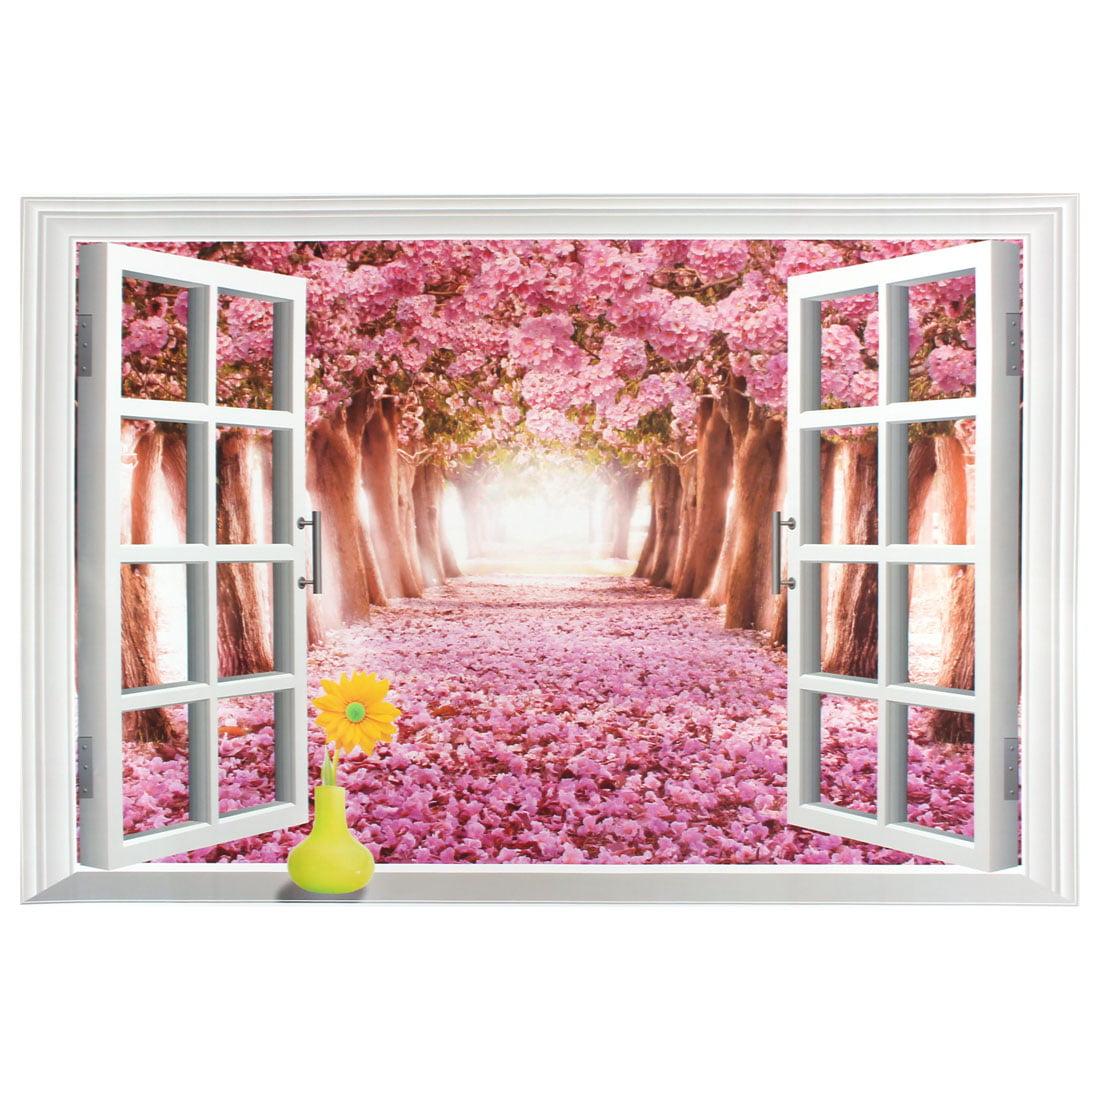 Unique Bargains Sakura Pattern 3D Window Scenery Removable Wall Sticker Art Mural Decal 90x60cm